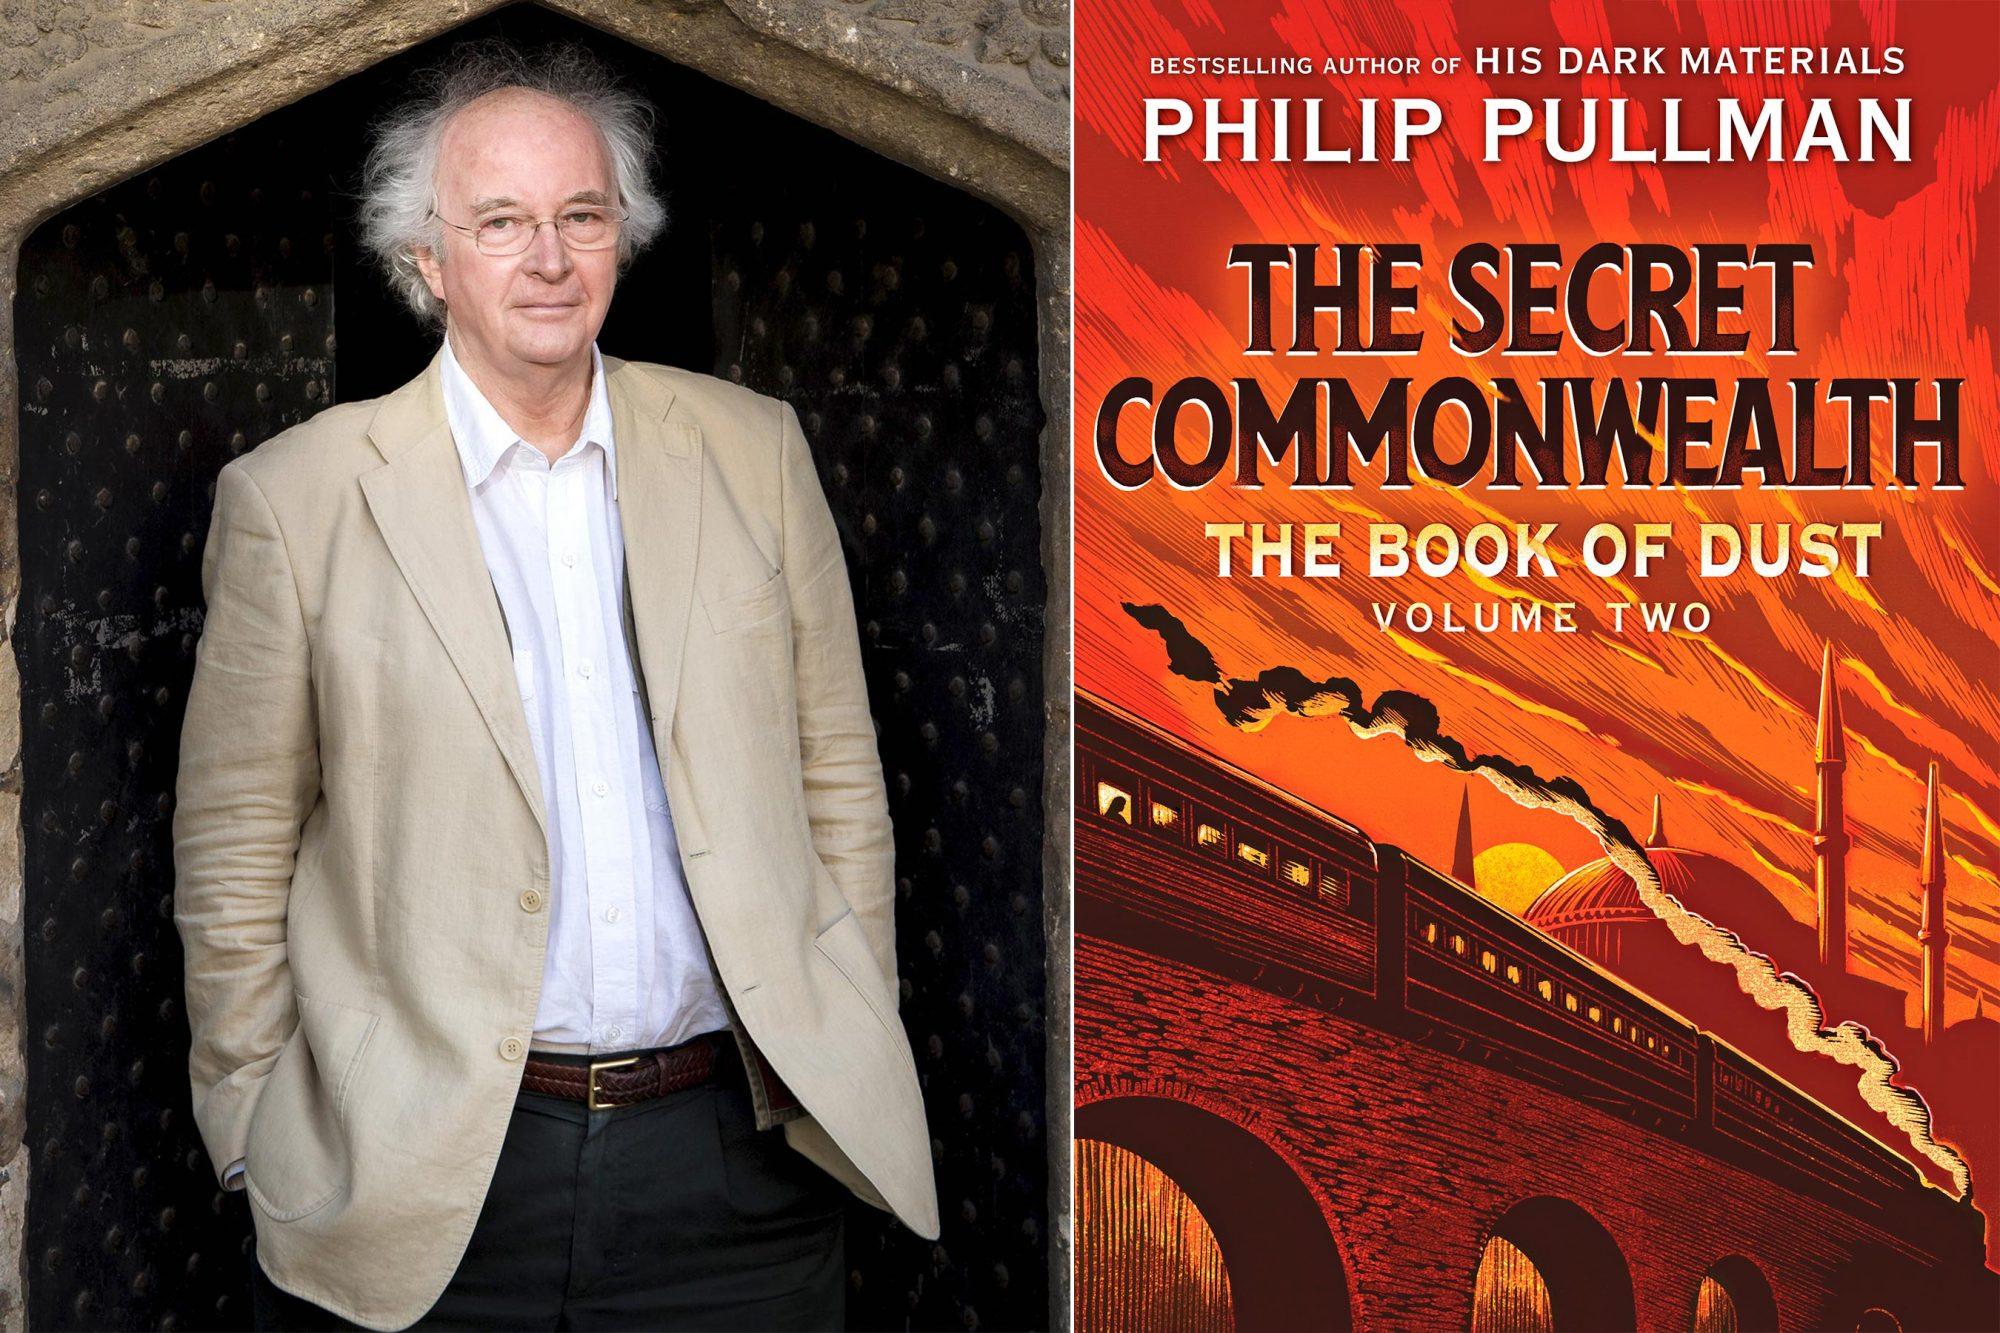 Philip Pullman / The Secret Commonwealth